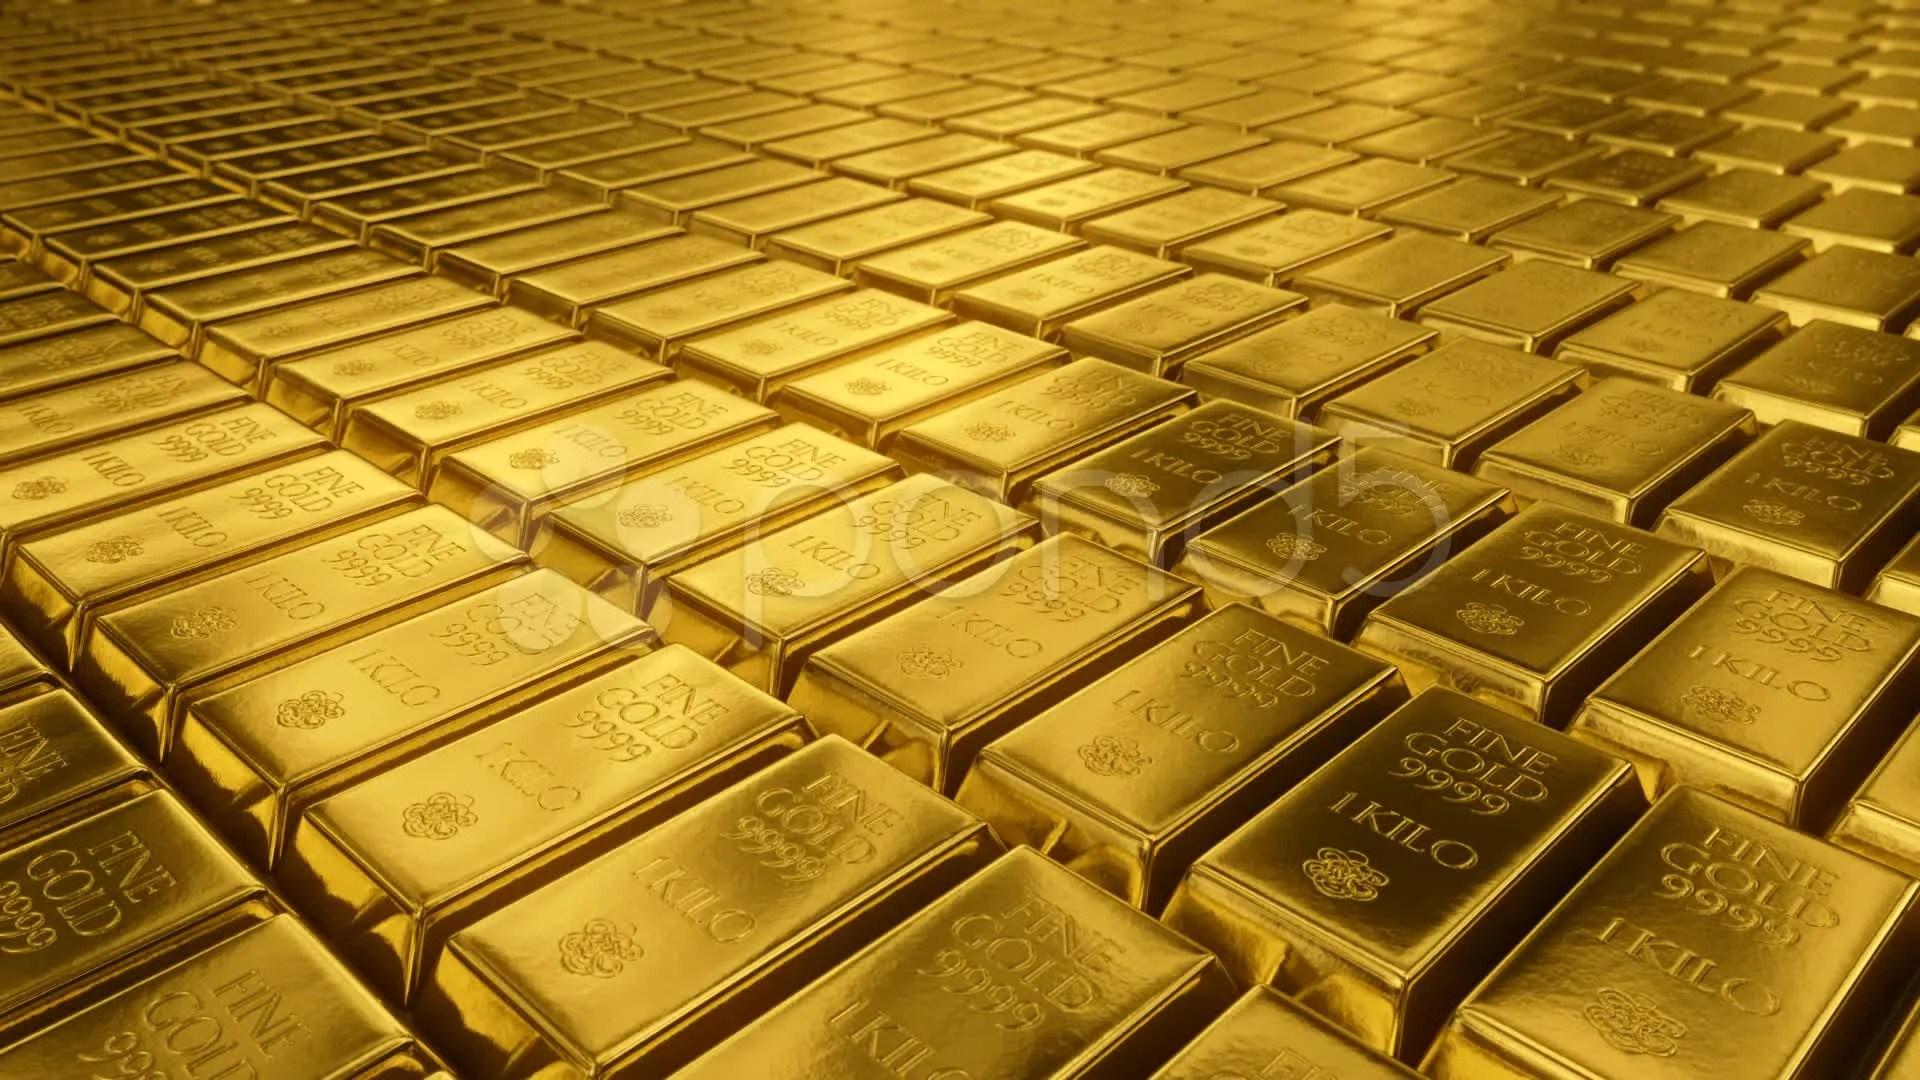 Soccer Iphone Wallpaper Hd Gold Bullion Goldbar Treasury Wealth Ingot Luxury Finance